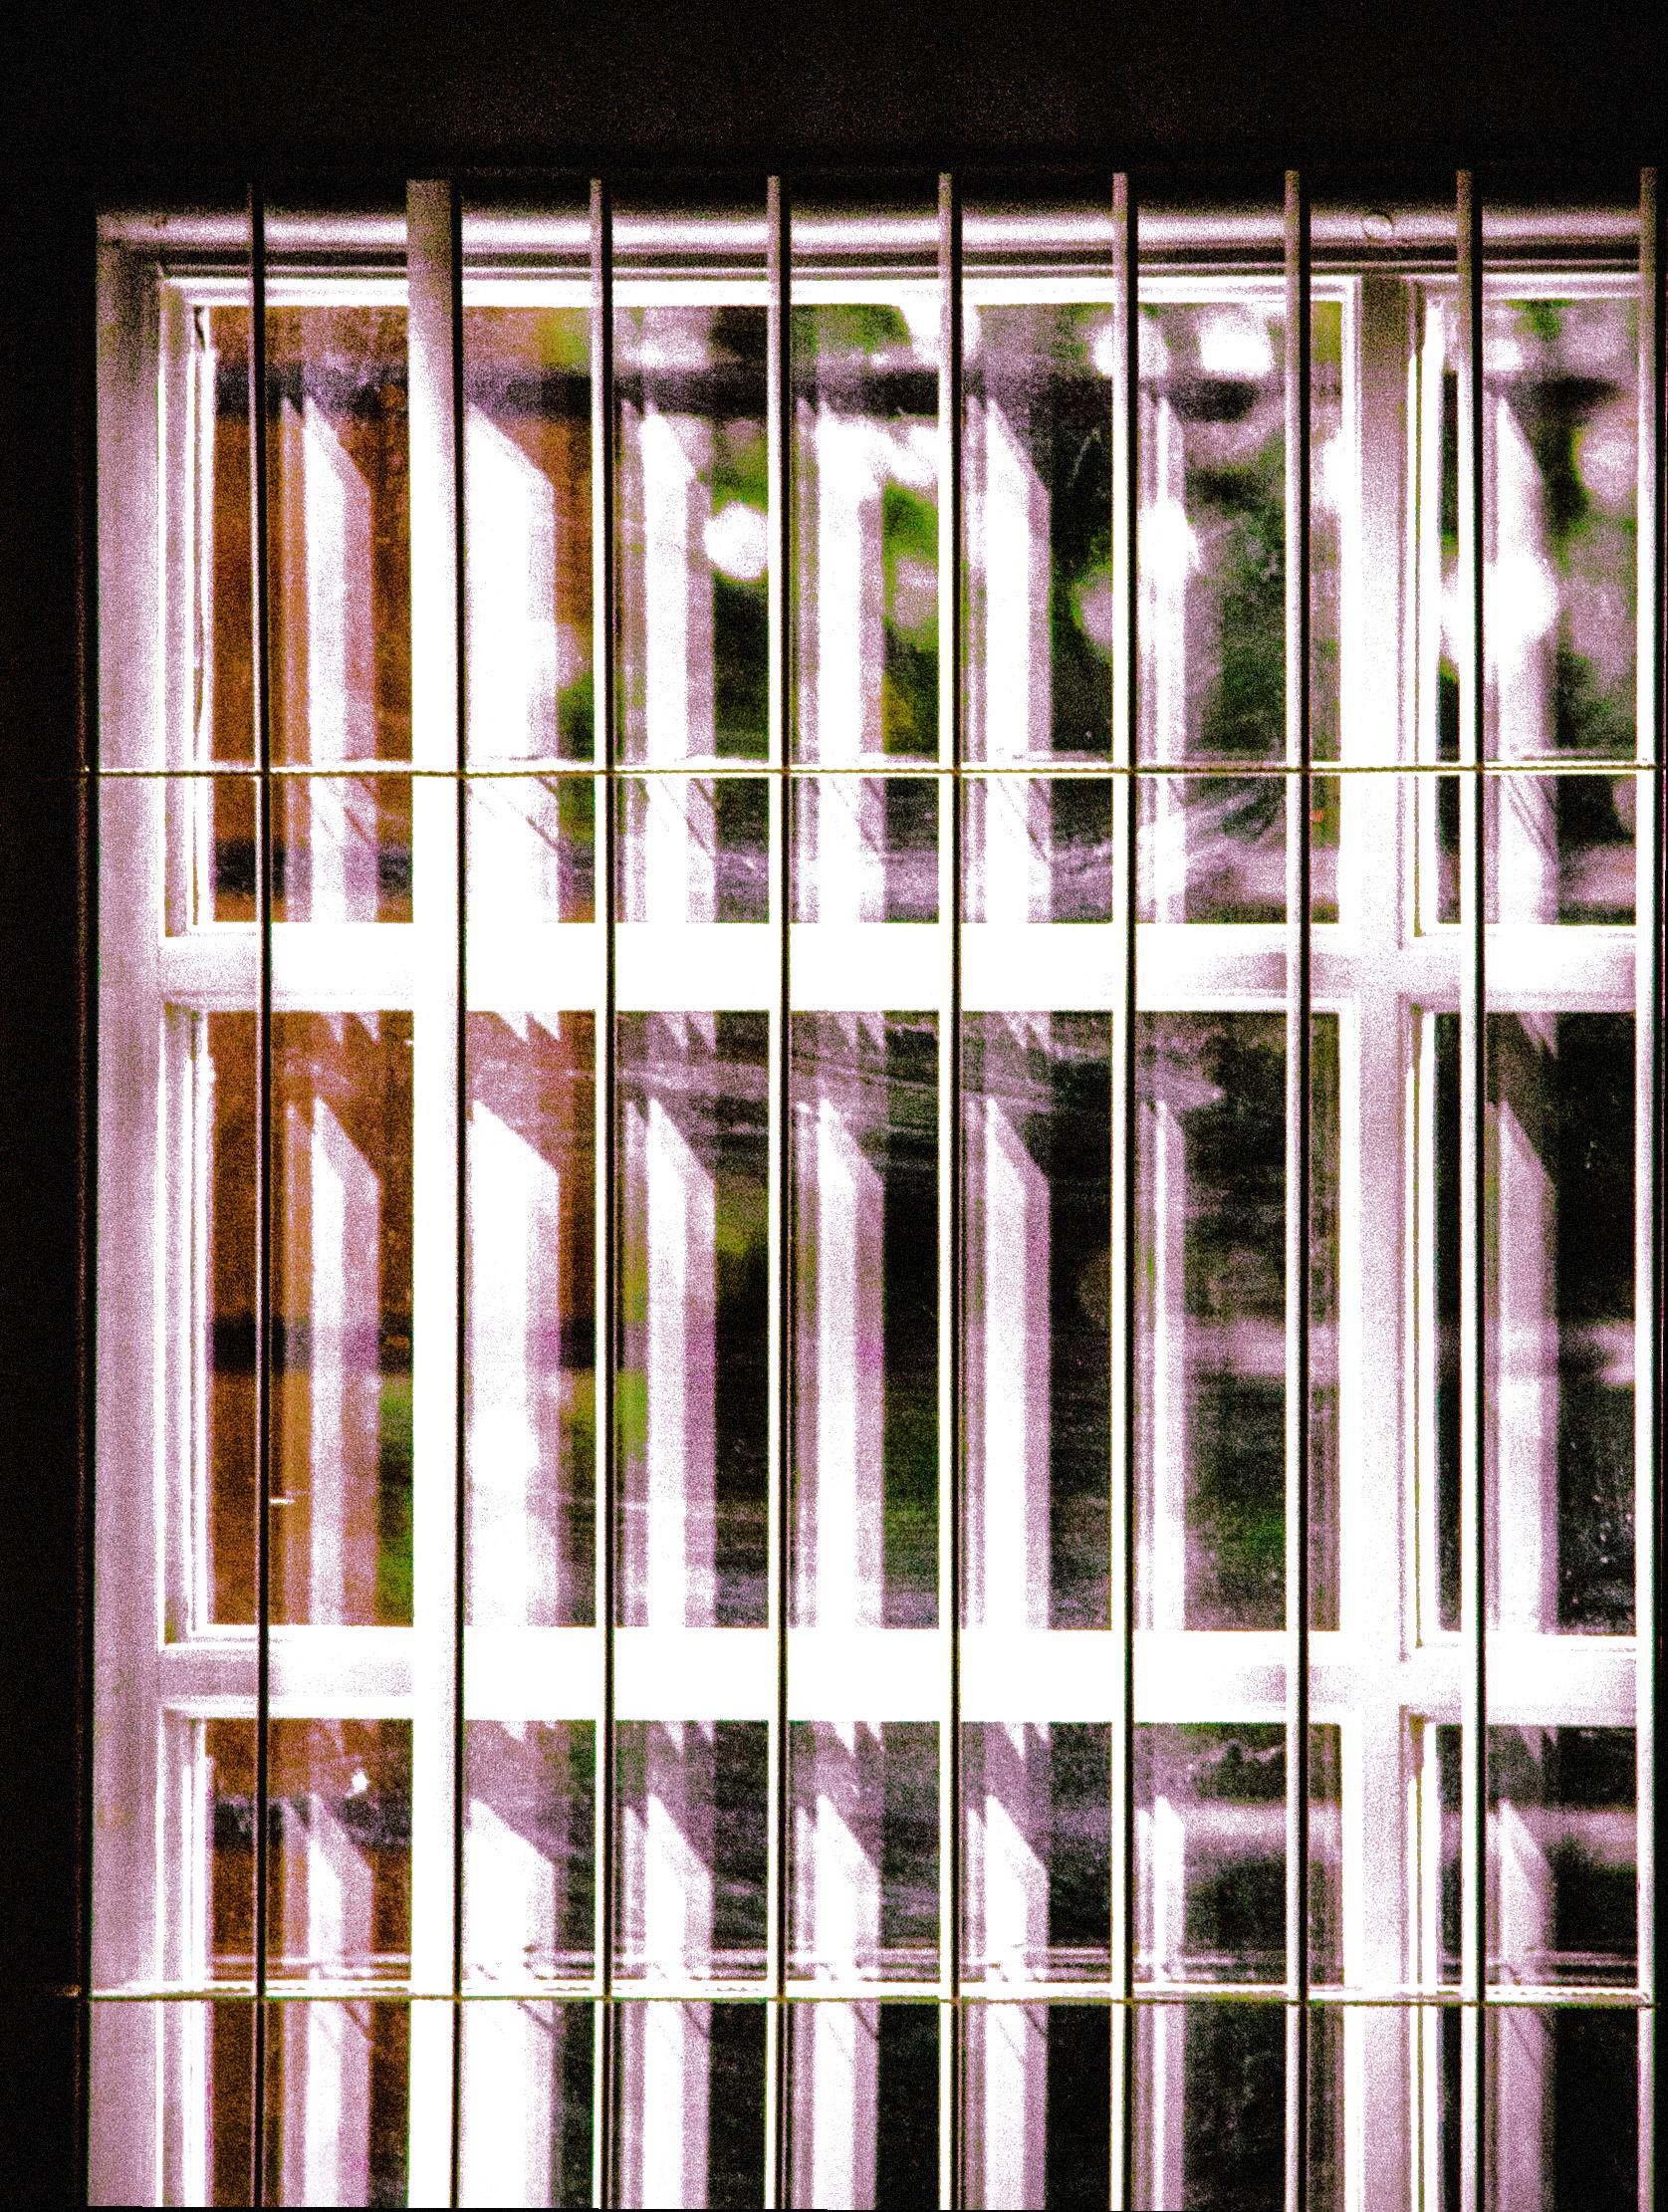 darktable interpretation of Lightroom CC edits